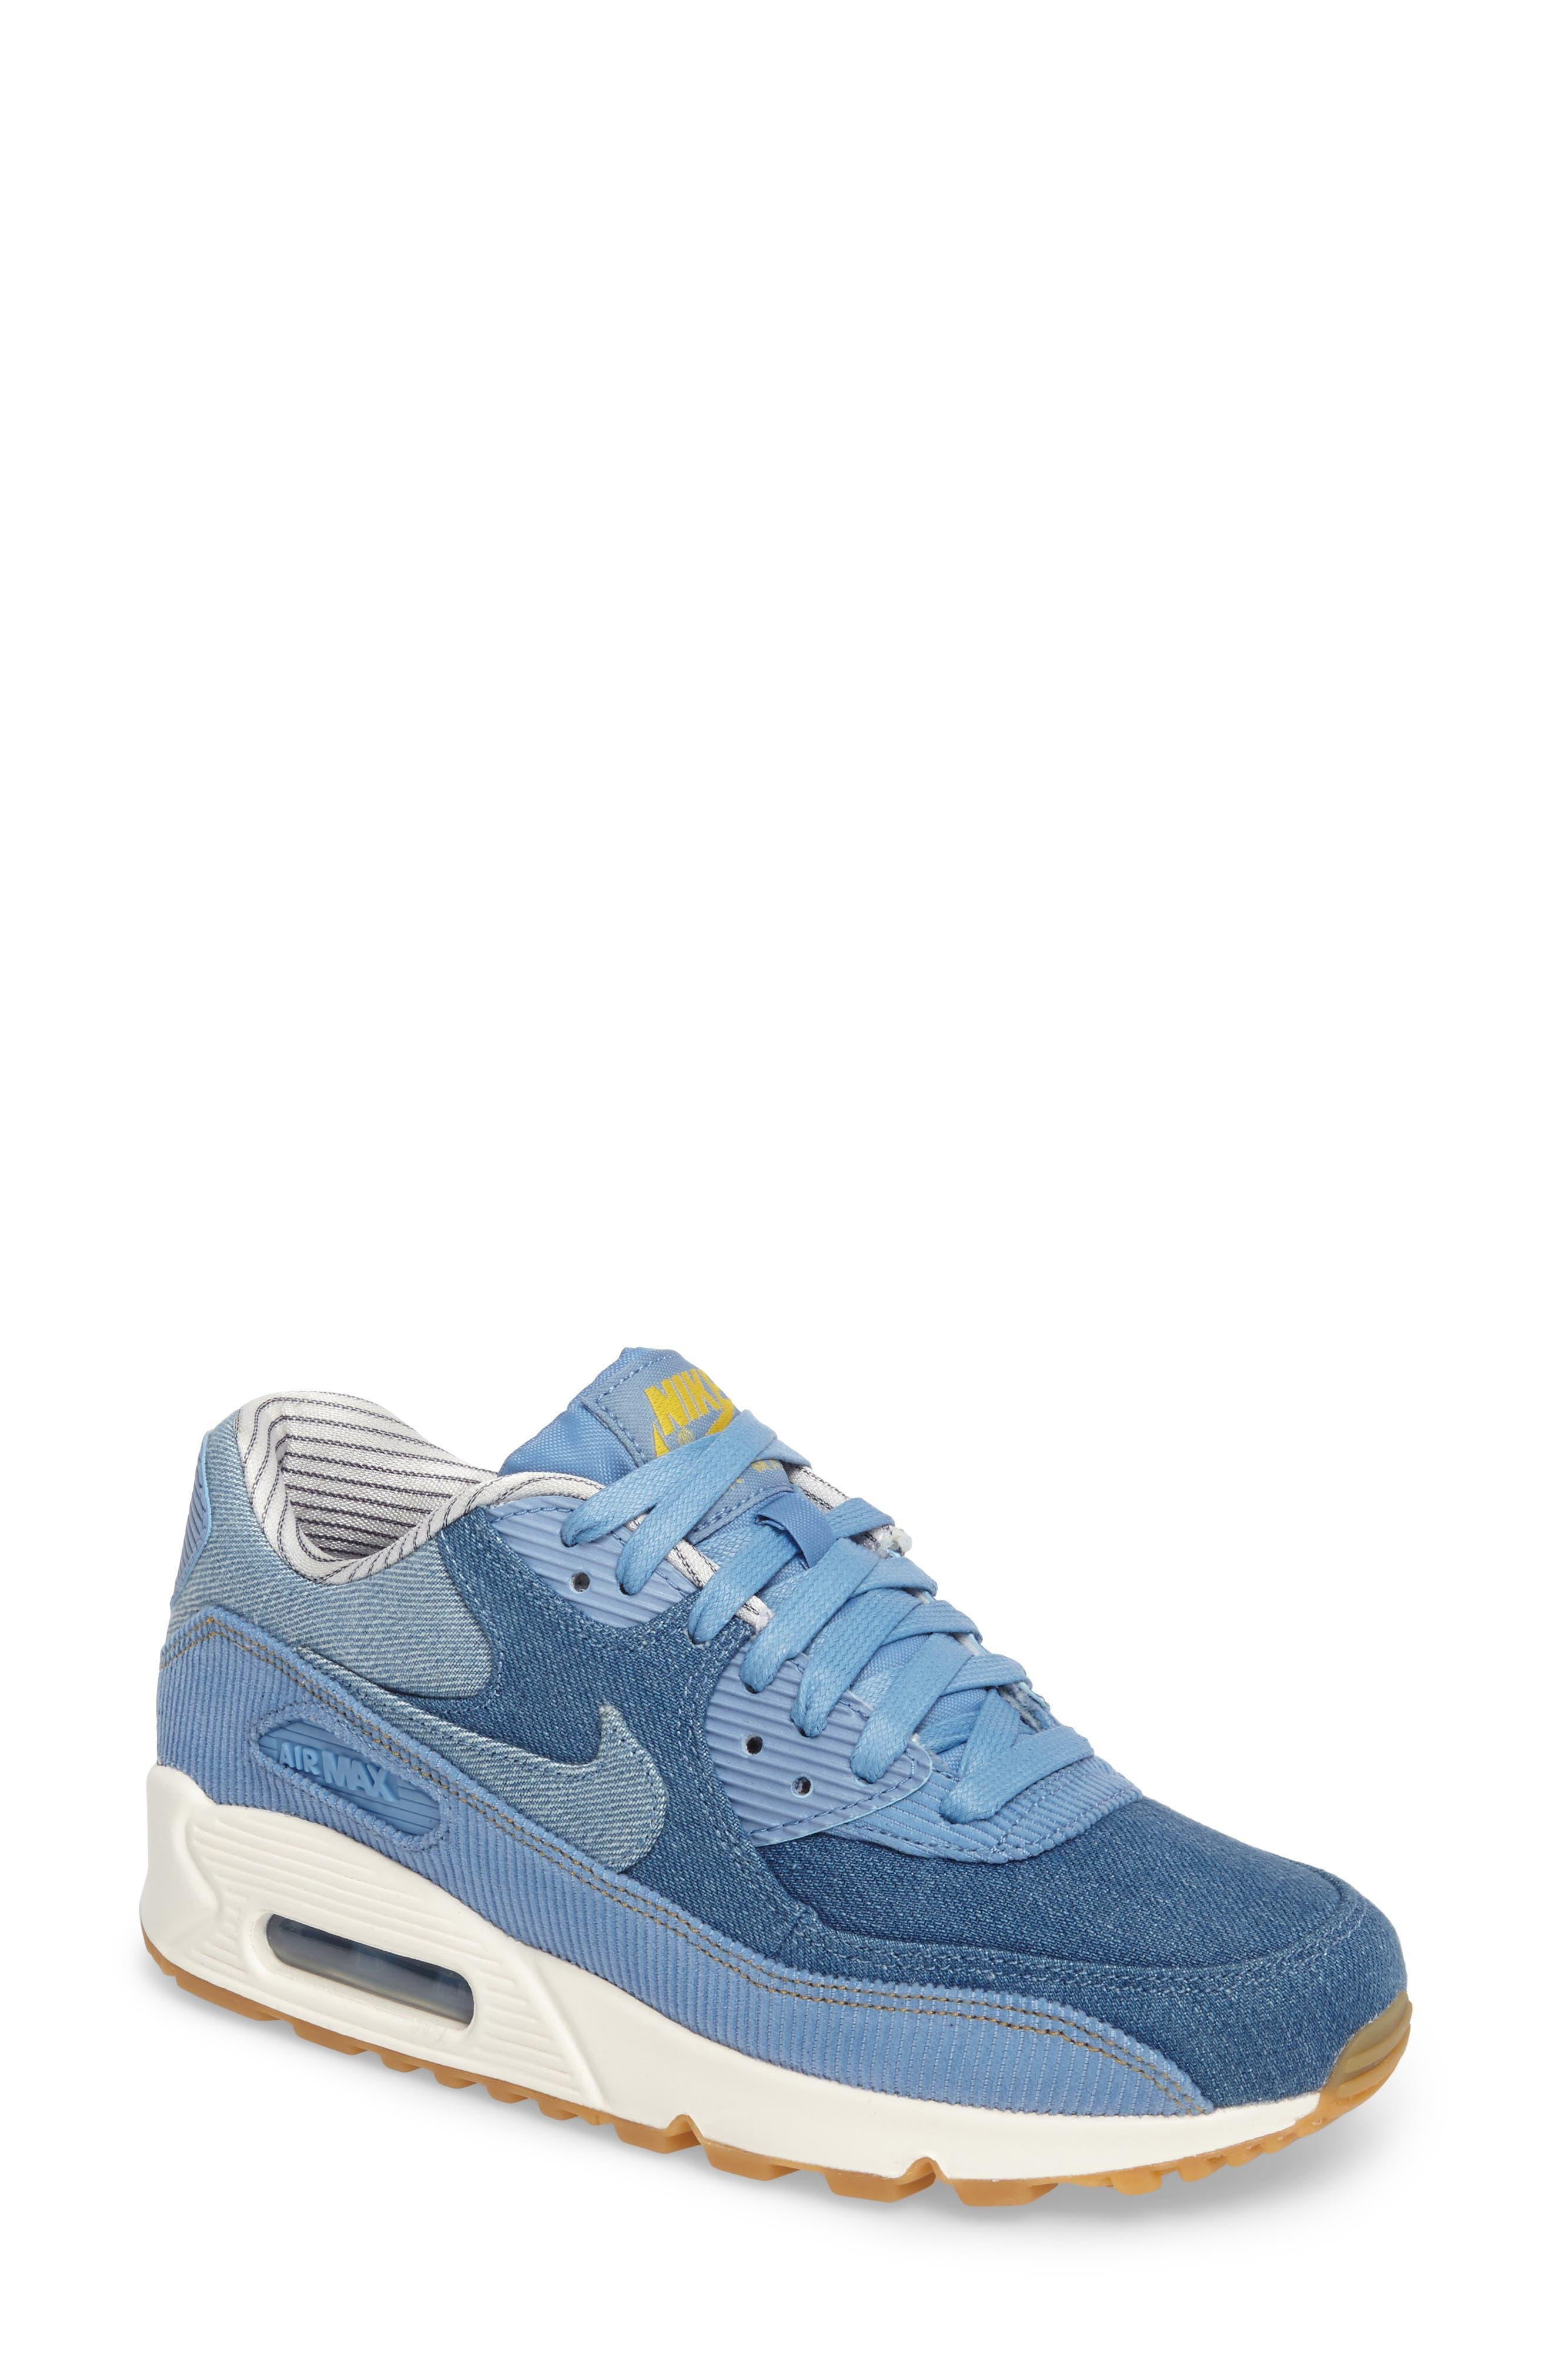 Air Max 90 SE Sneaker,                             Main thumbnail 8, color,